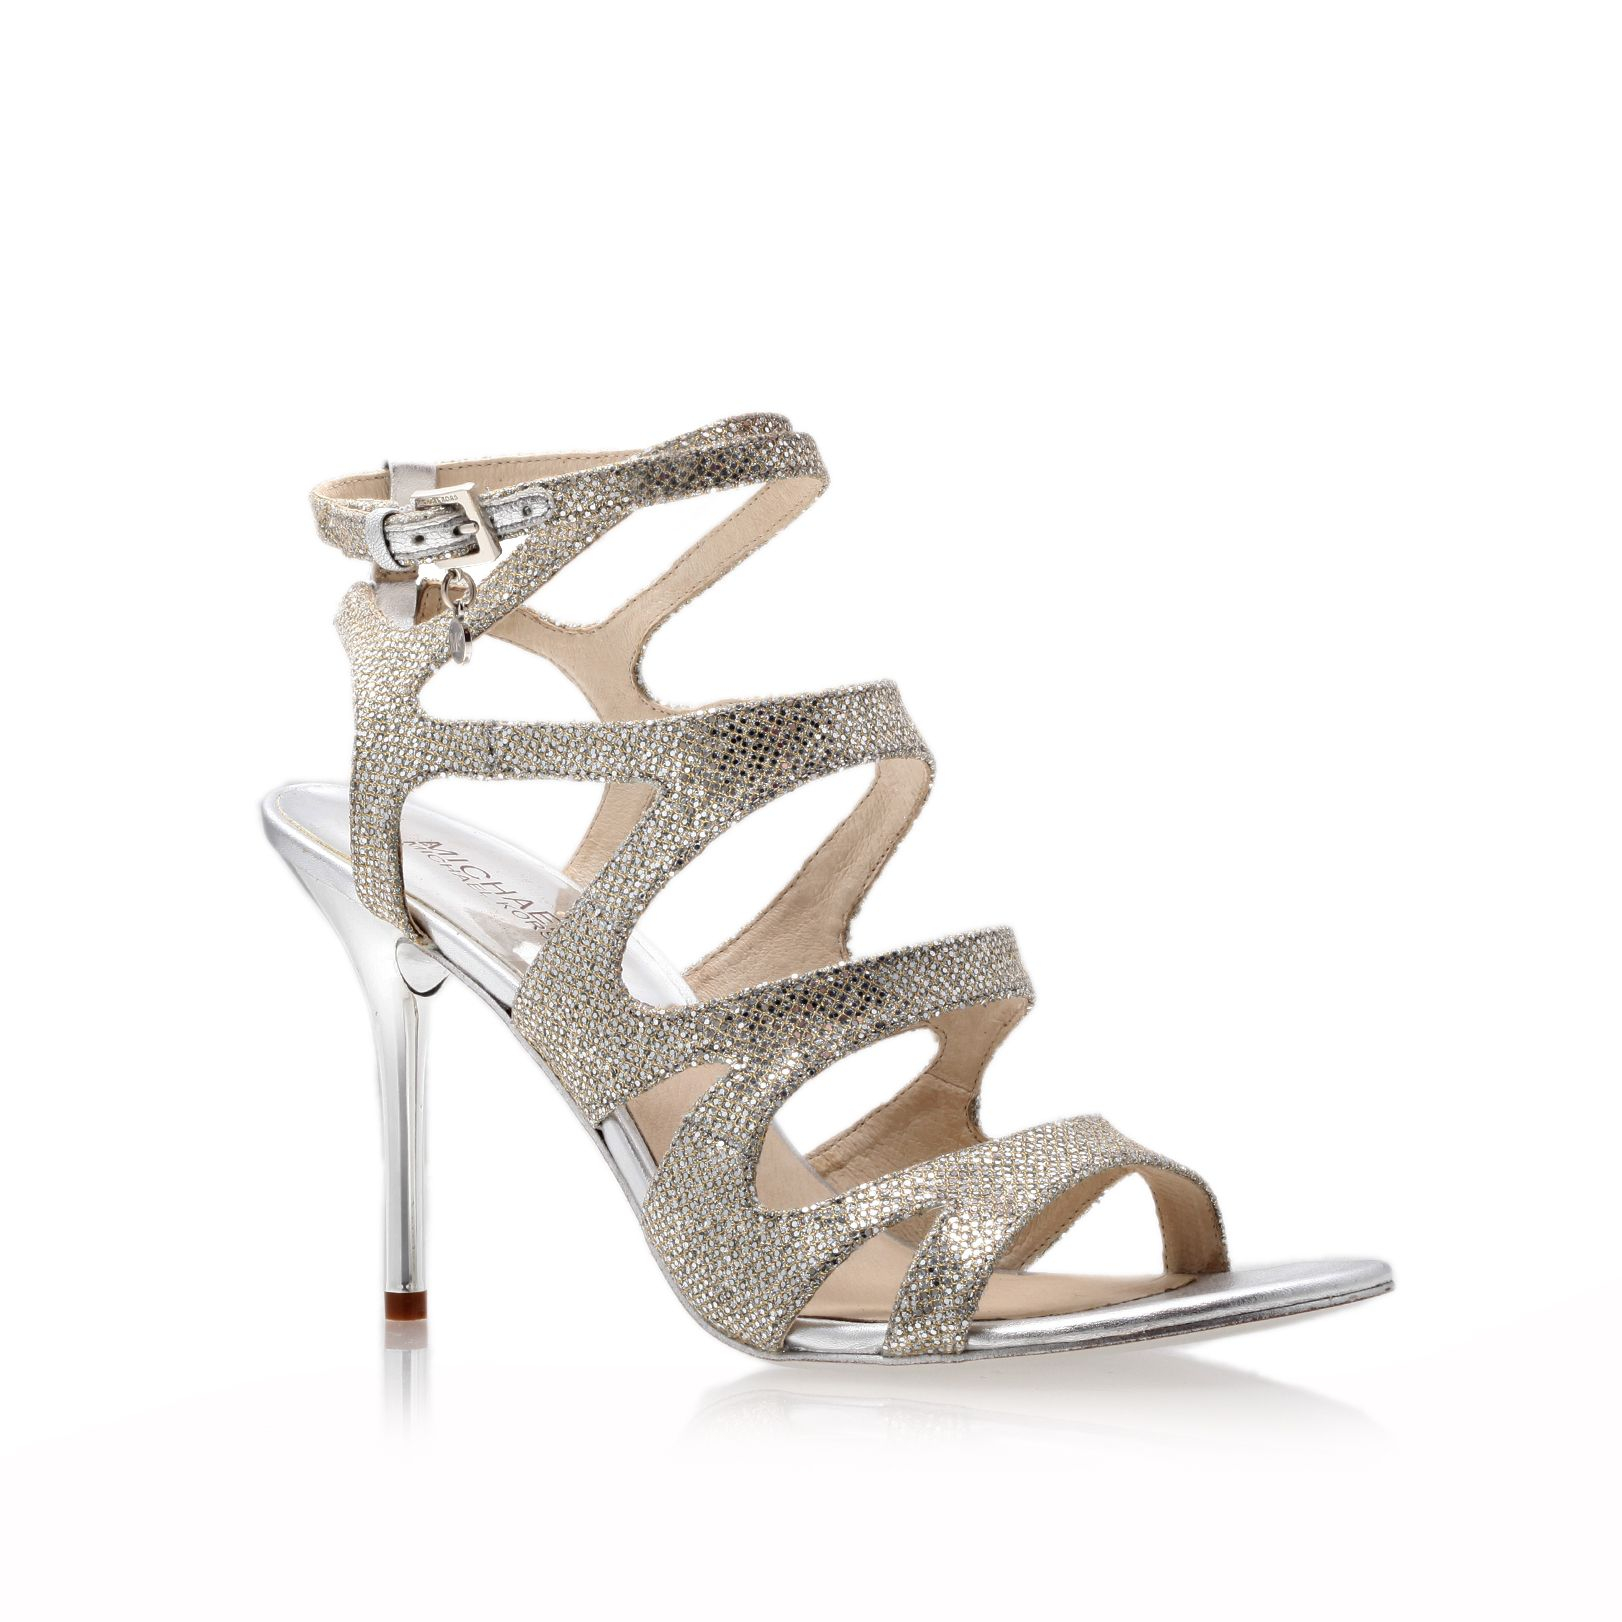 michael kors yvonne high heeled sandals in silver lyst. Black Bedroom Furniture Sets. Home Design Ideas